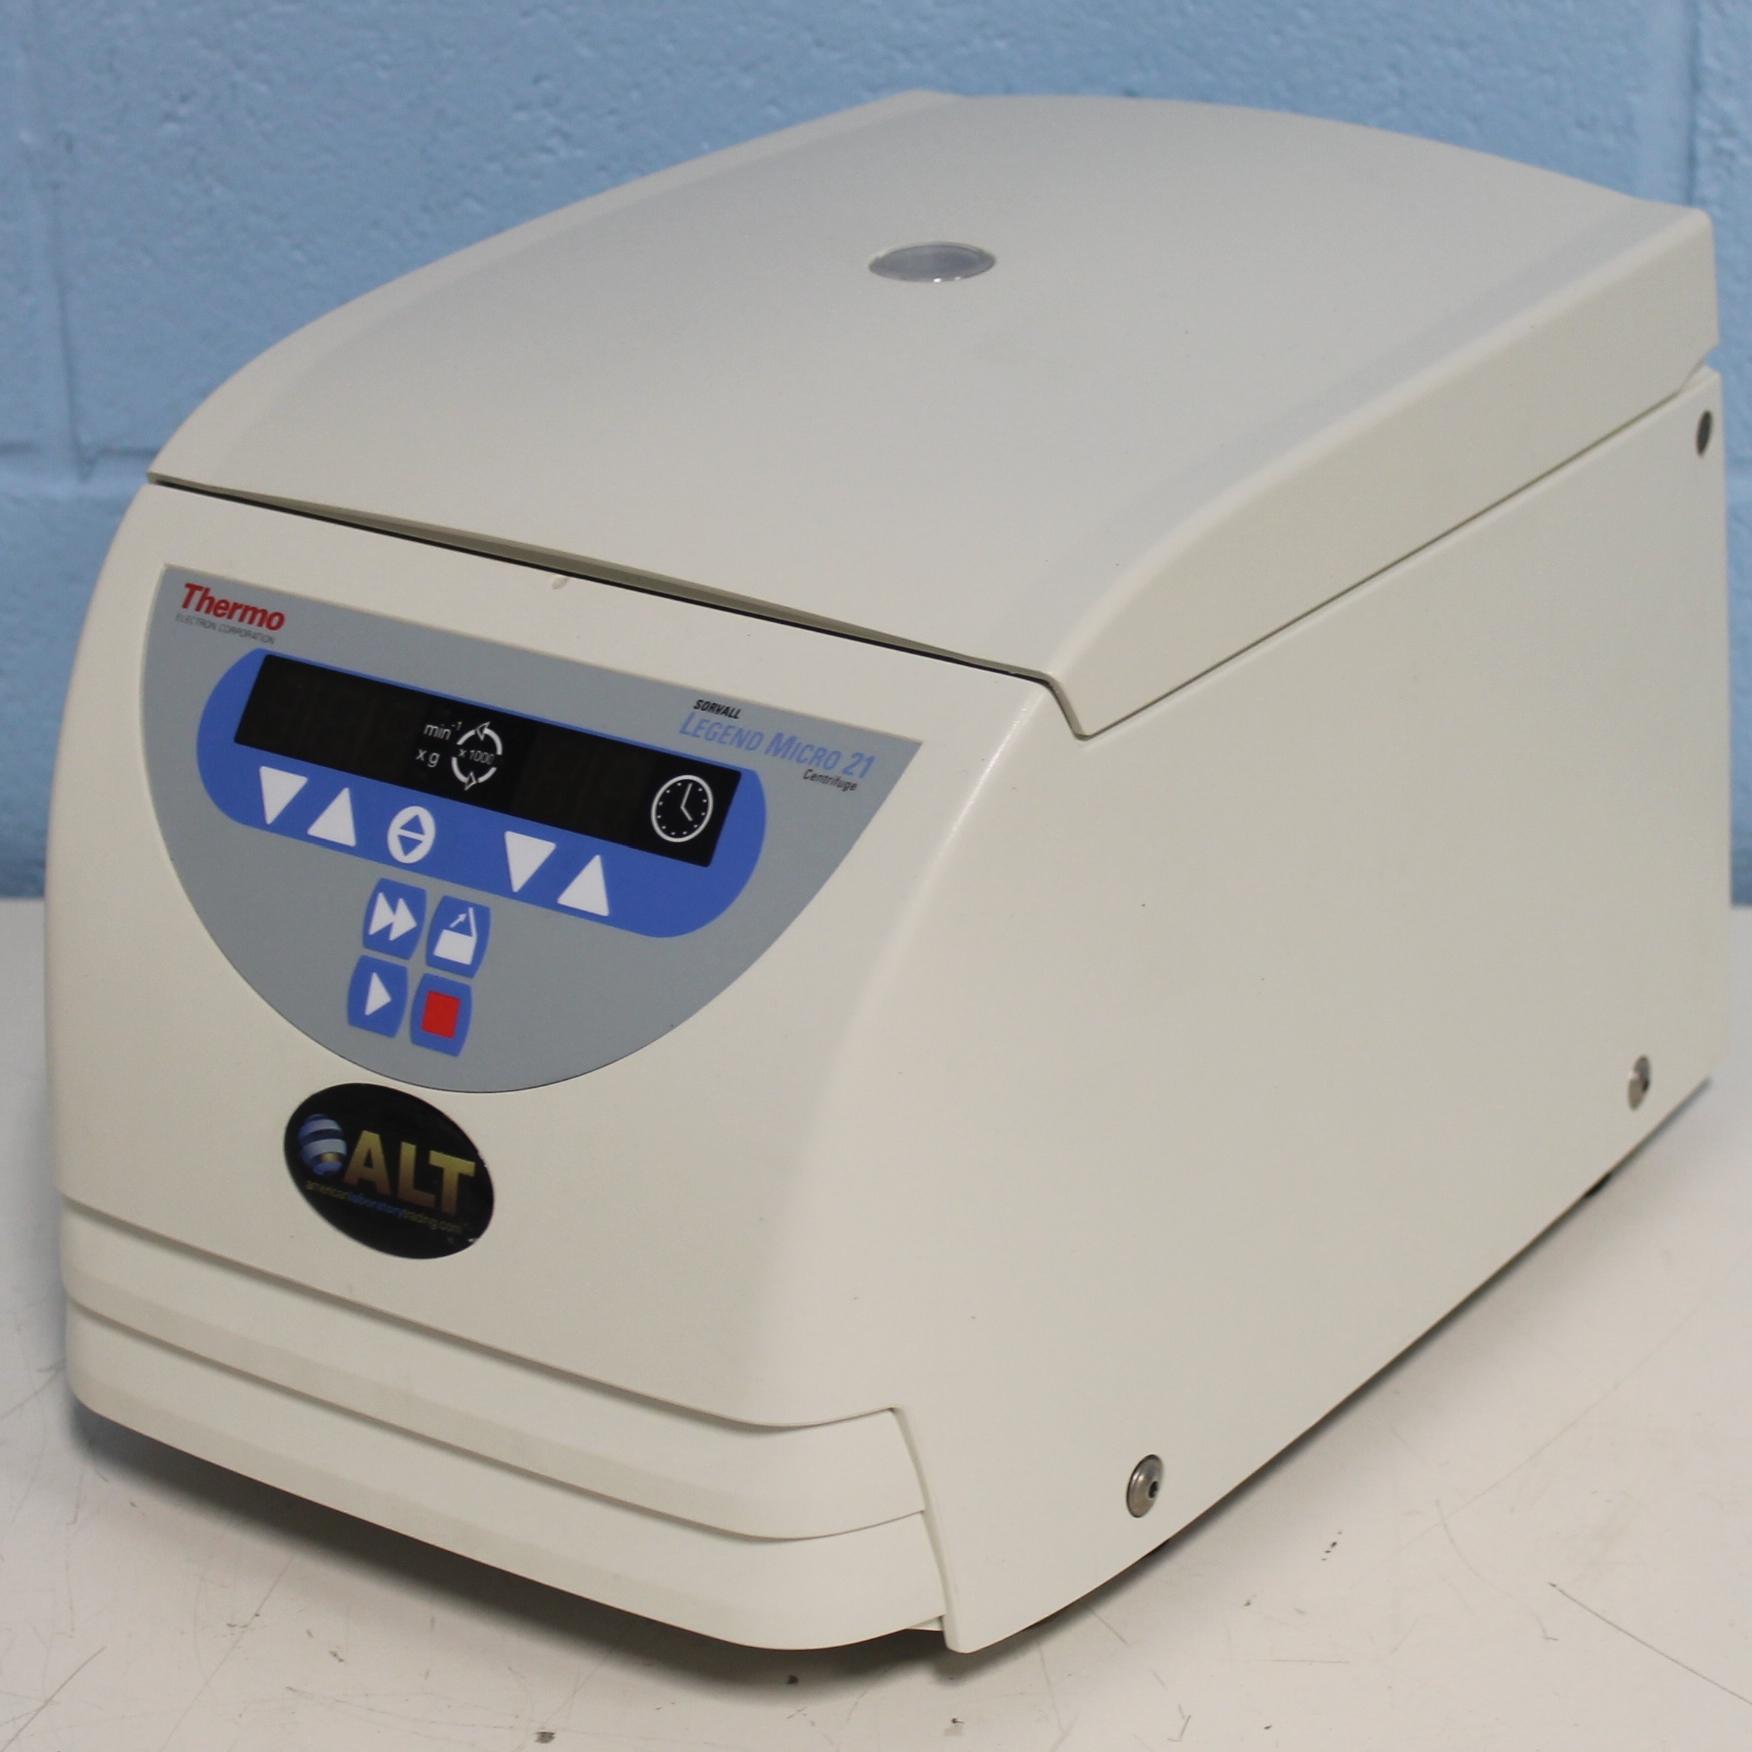 Thermo Scientific Sorvall Legend Micro 21 Ventilated Microcentrifuge Image